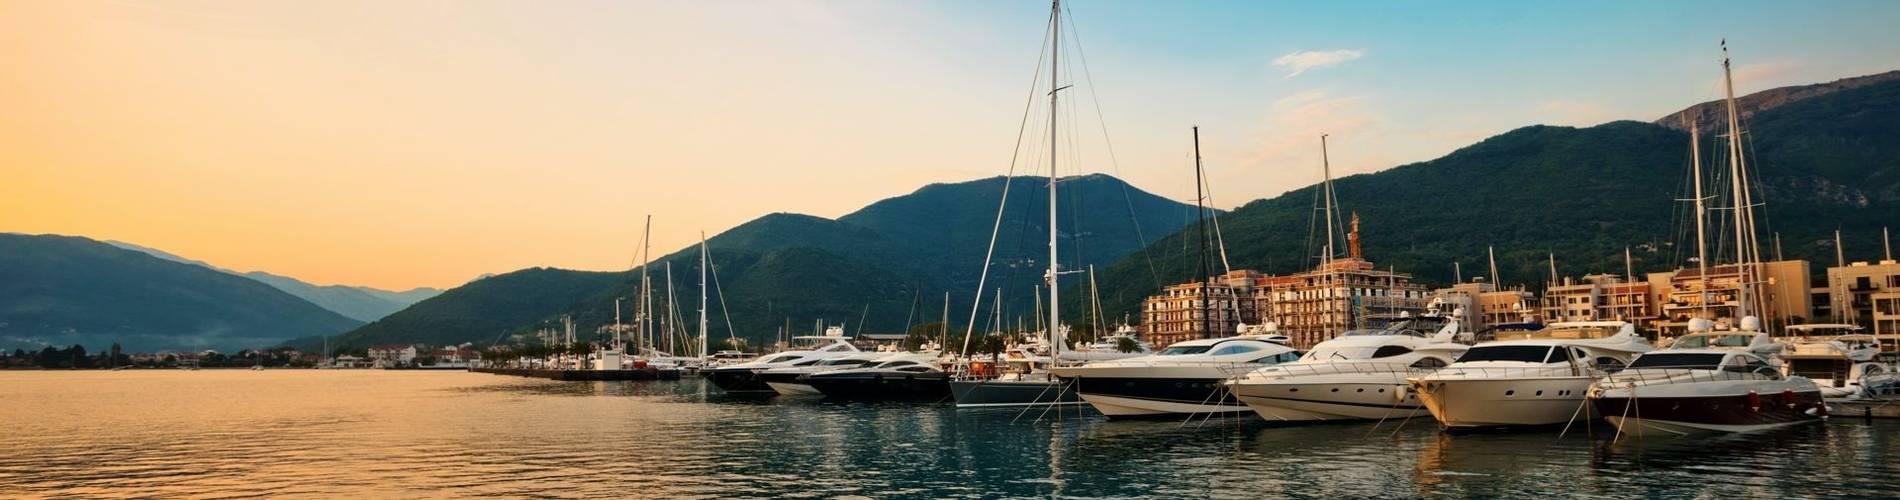 Montenegro - Tivat.jpg